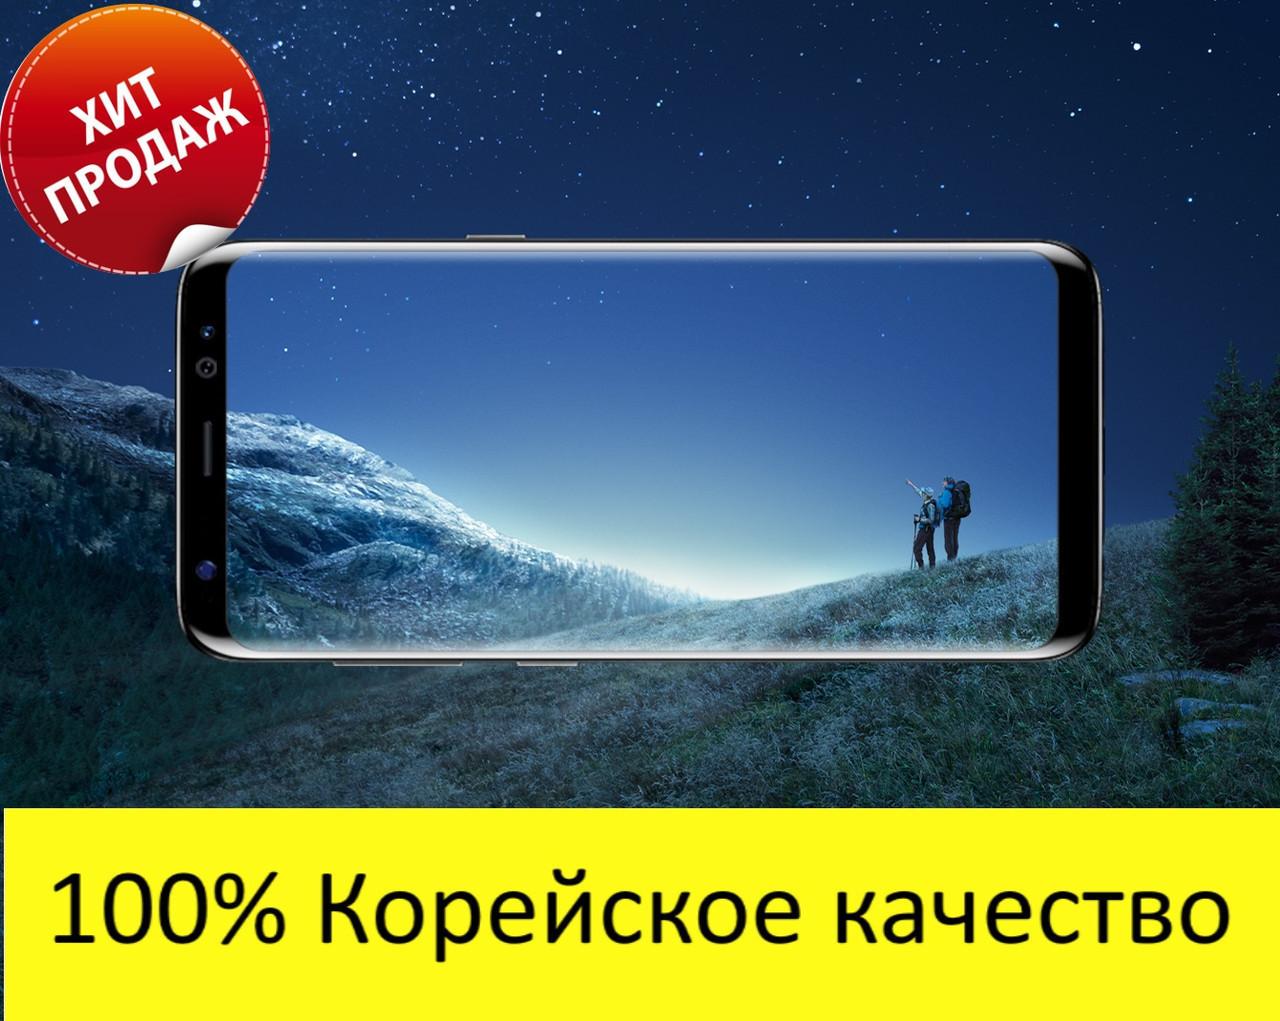 Внимание 100% Корея Samsung  S9 +Подарки (копия самсунг s6/s8/s5)